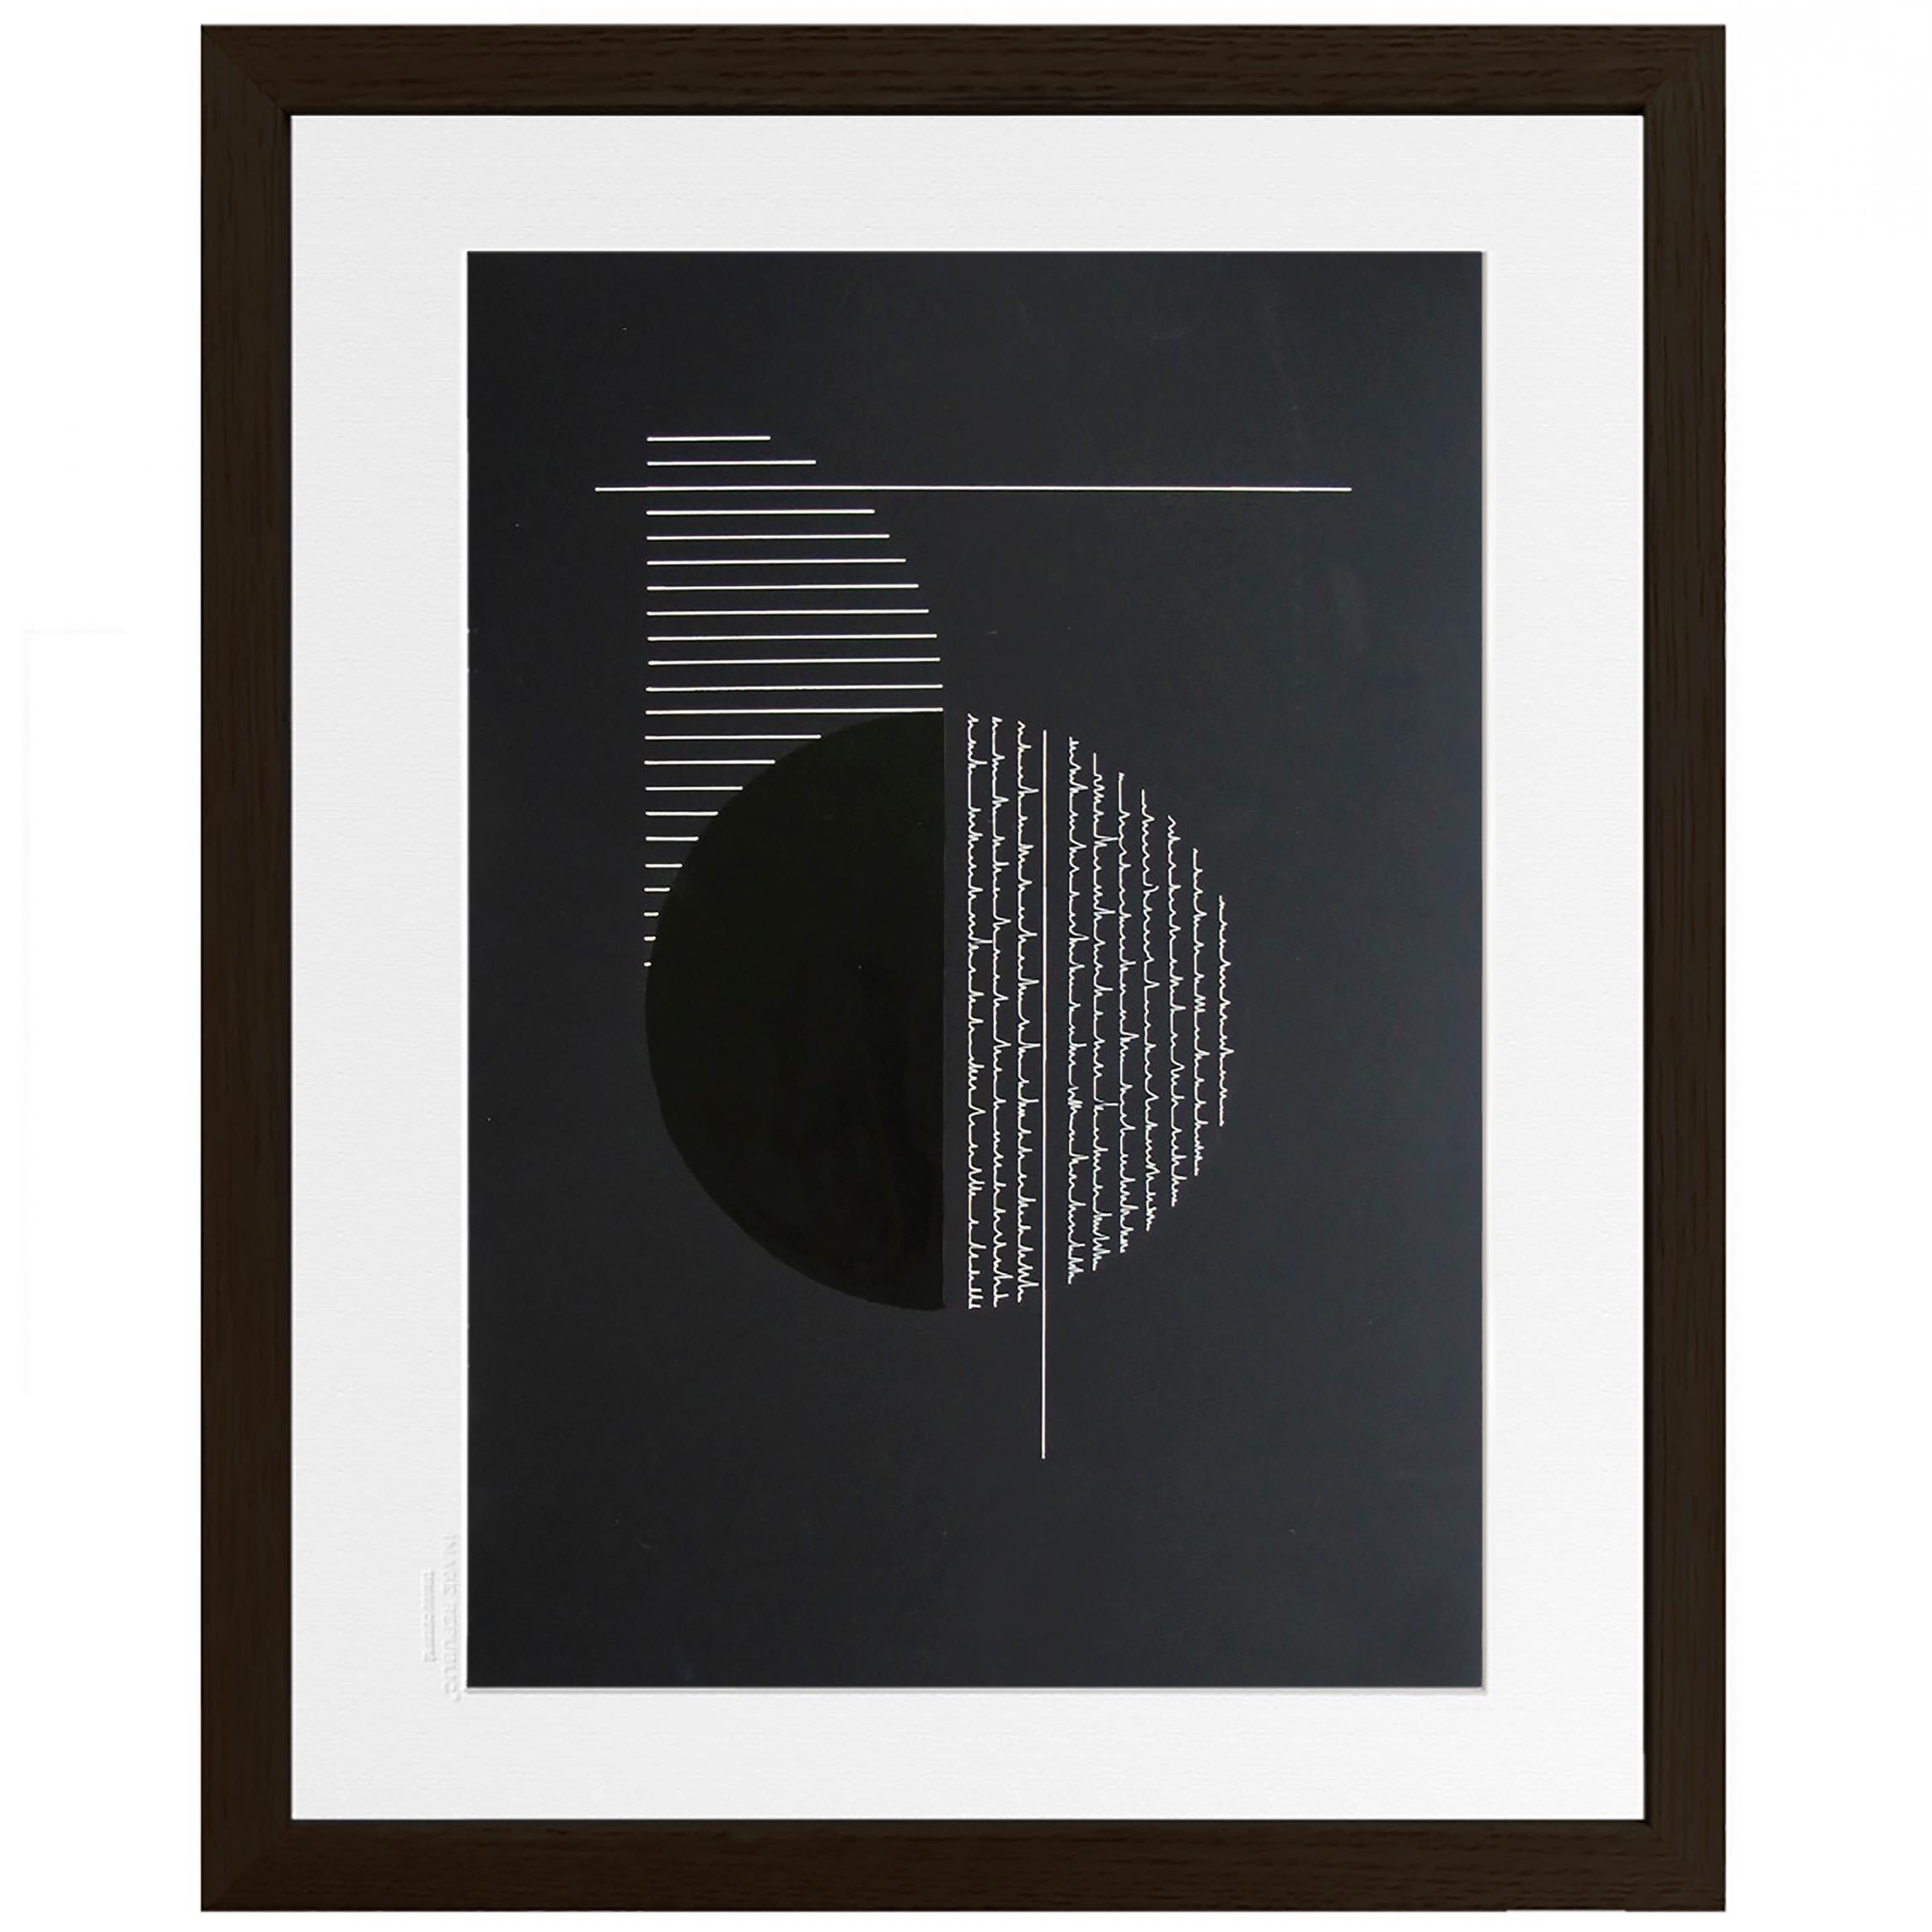 Serie II number 4 - minimalism geometric circle and stripes black and white